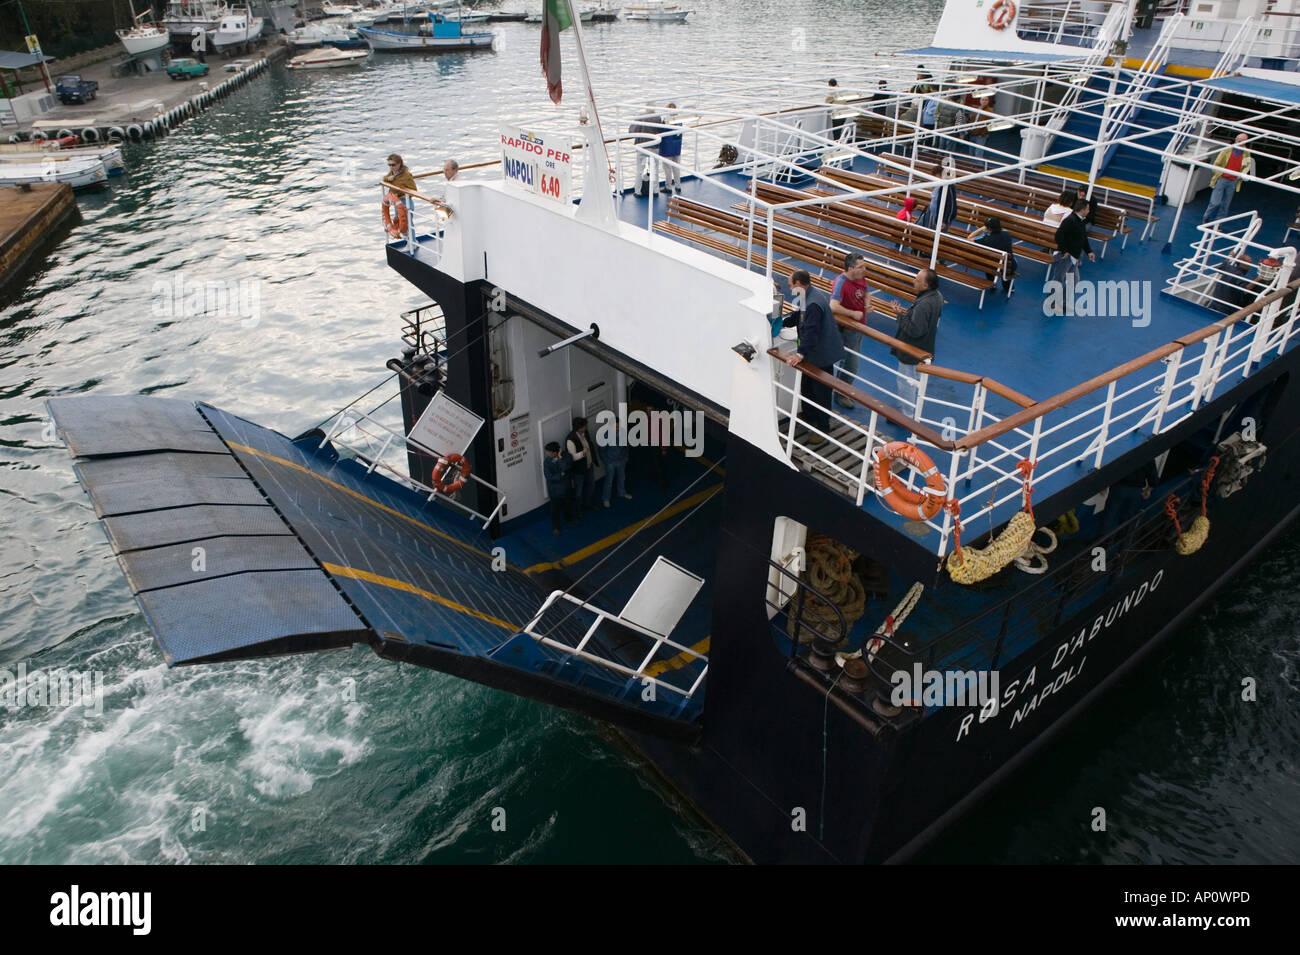 bateau naples ischia